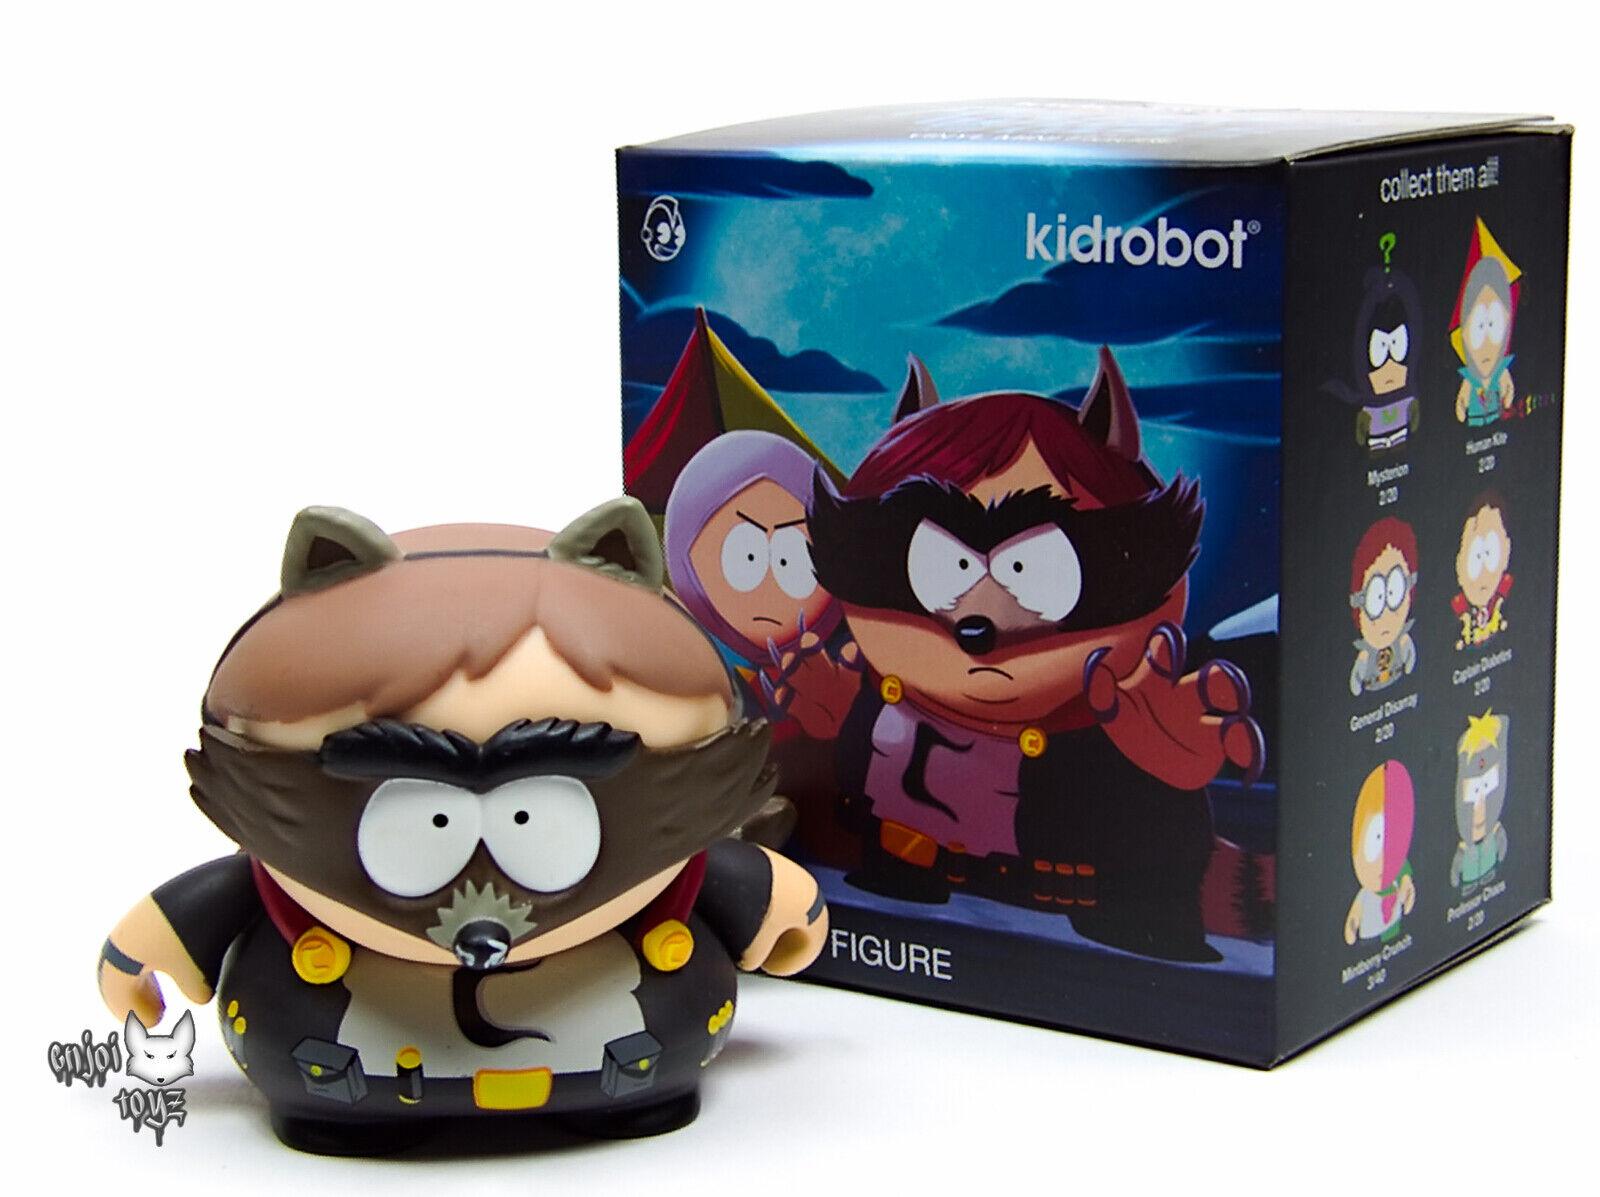 The Coon - Kidrobot South Park Fractured But Whole Vinyl Min